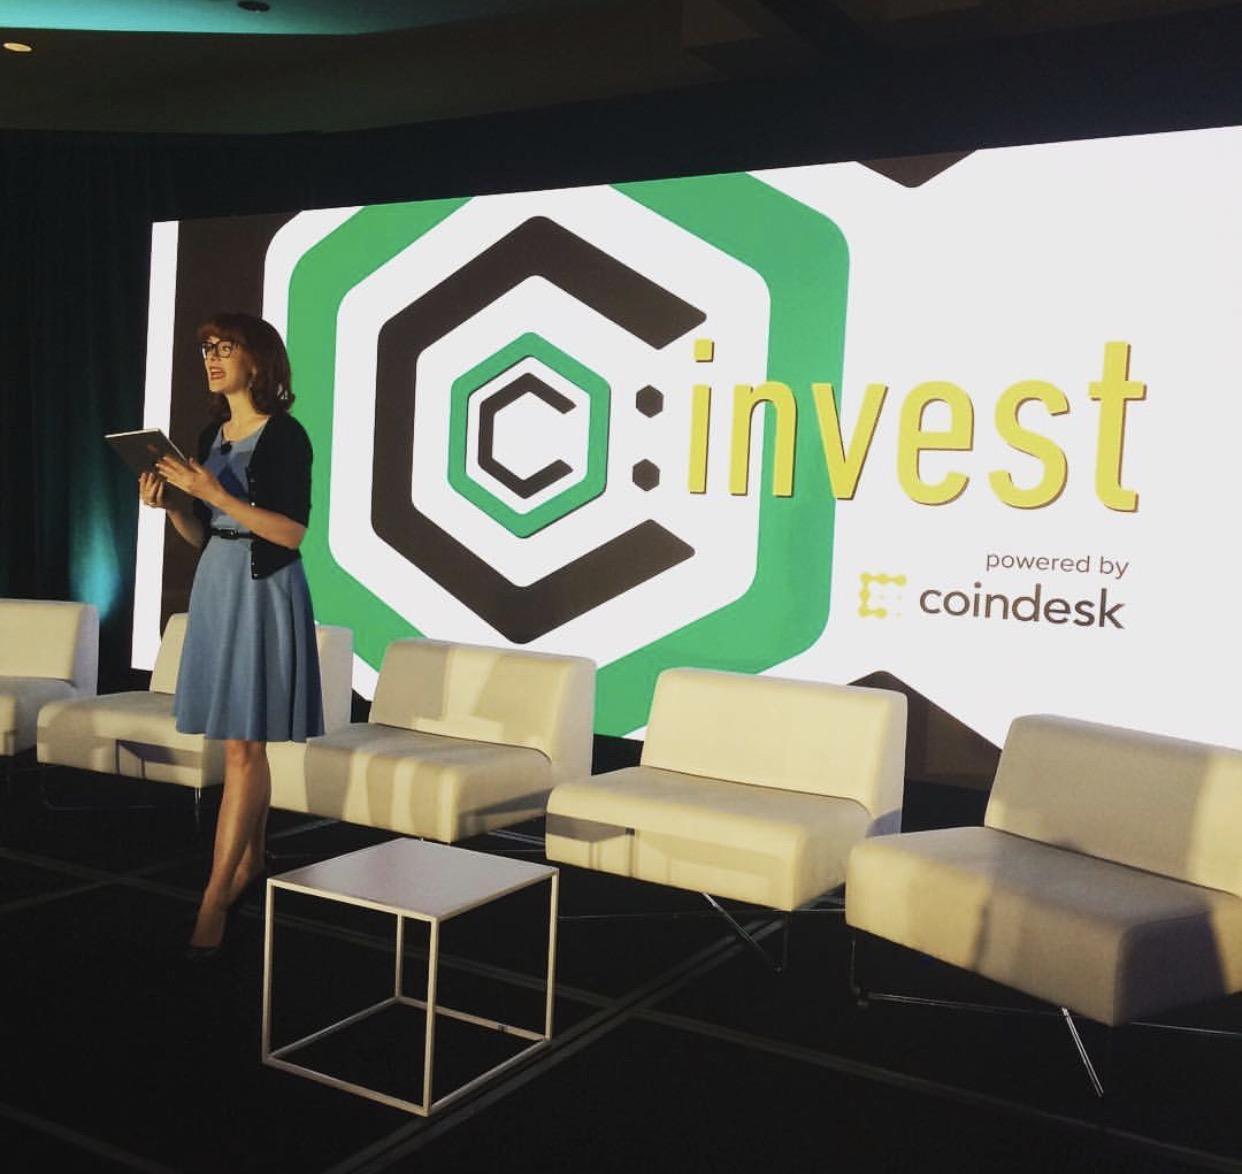 Bitcoin Girl appearing in TV series 'Hardfork'